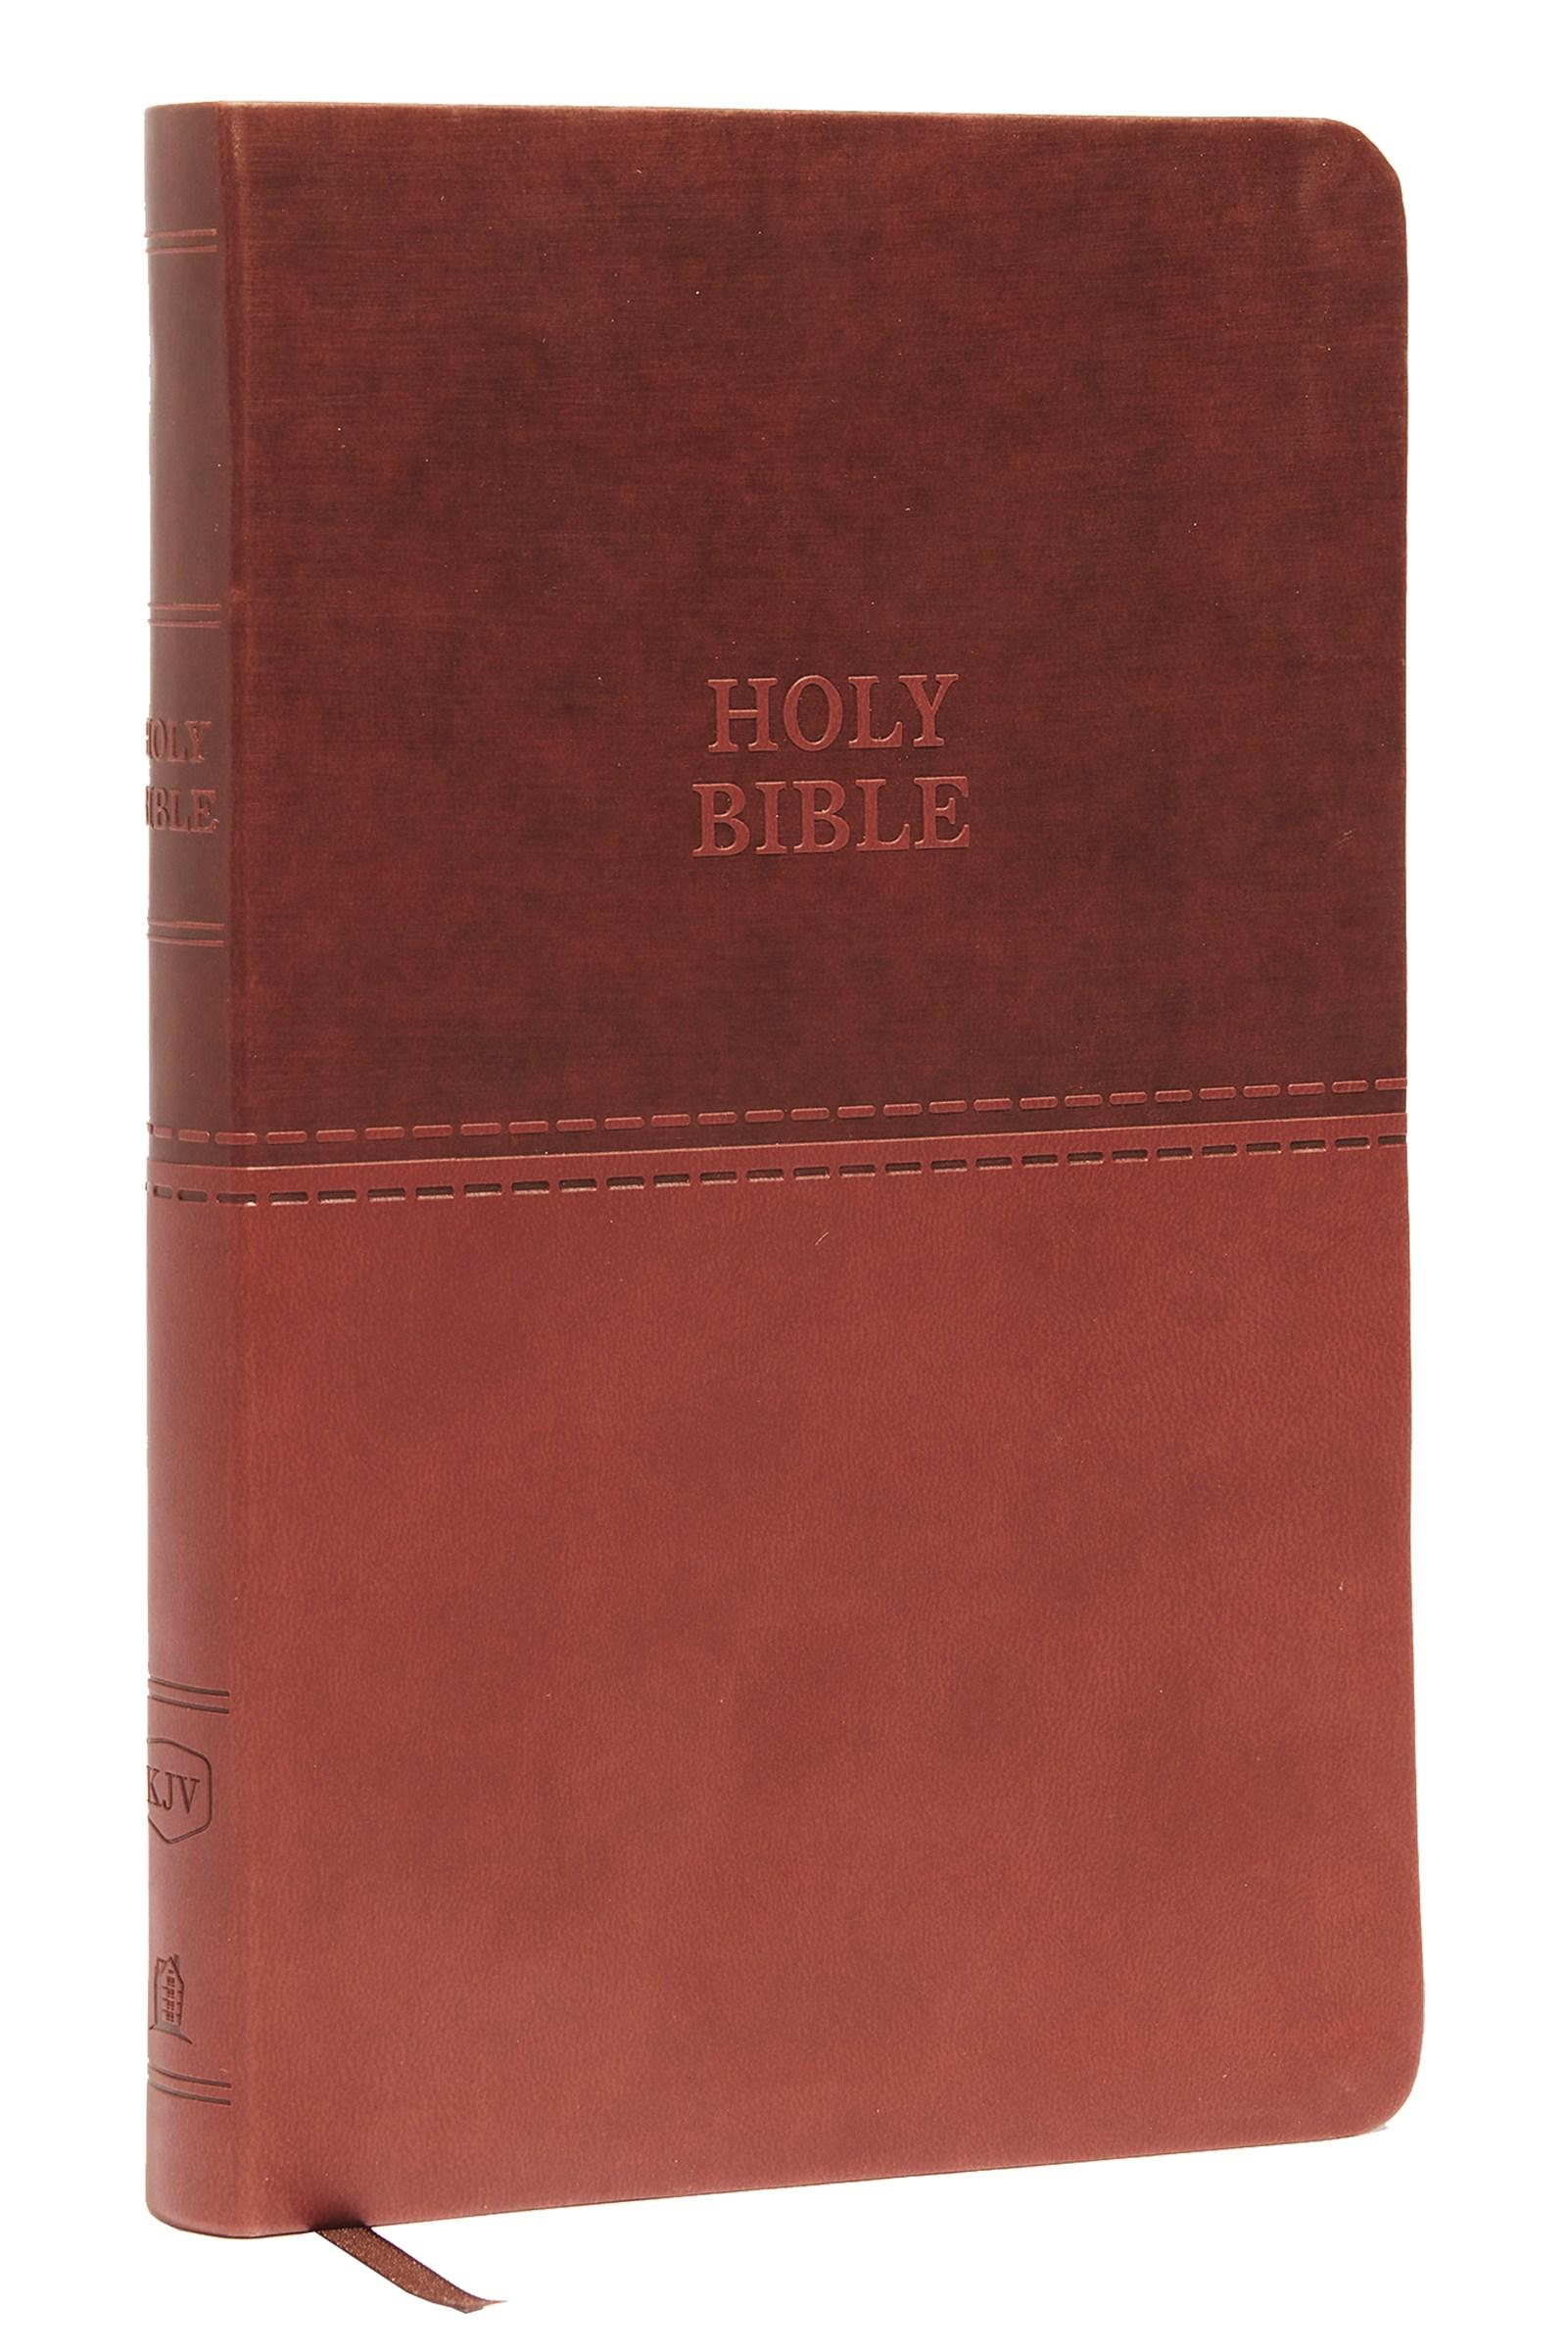 KJV Value Thinline Bible (Comfort Print)-Brown Leathersoft